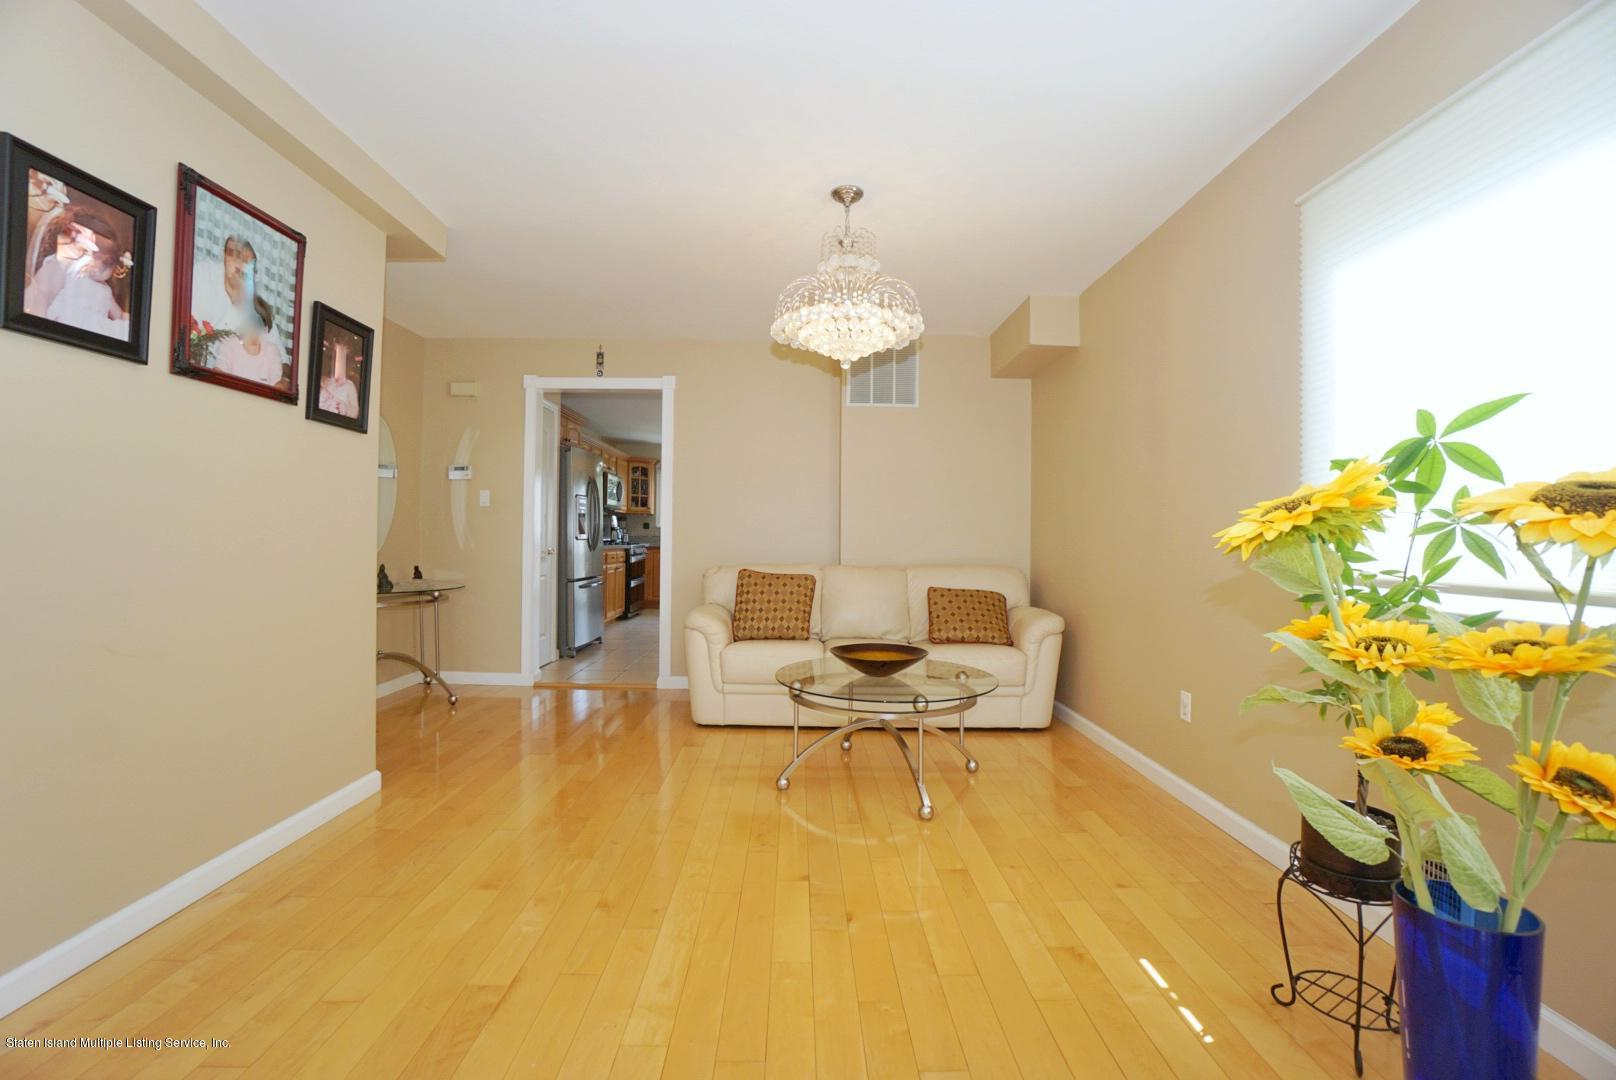 Single Family - Semi-Attached 18 Dunhill Lane  Staten Island, NY 10309, MLS-1139055-7